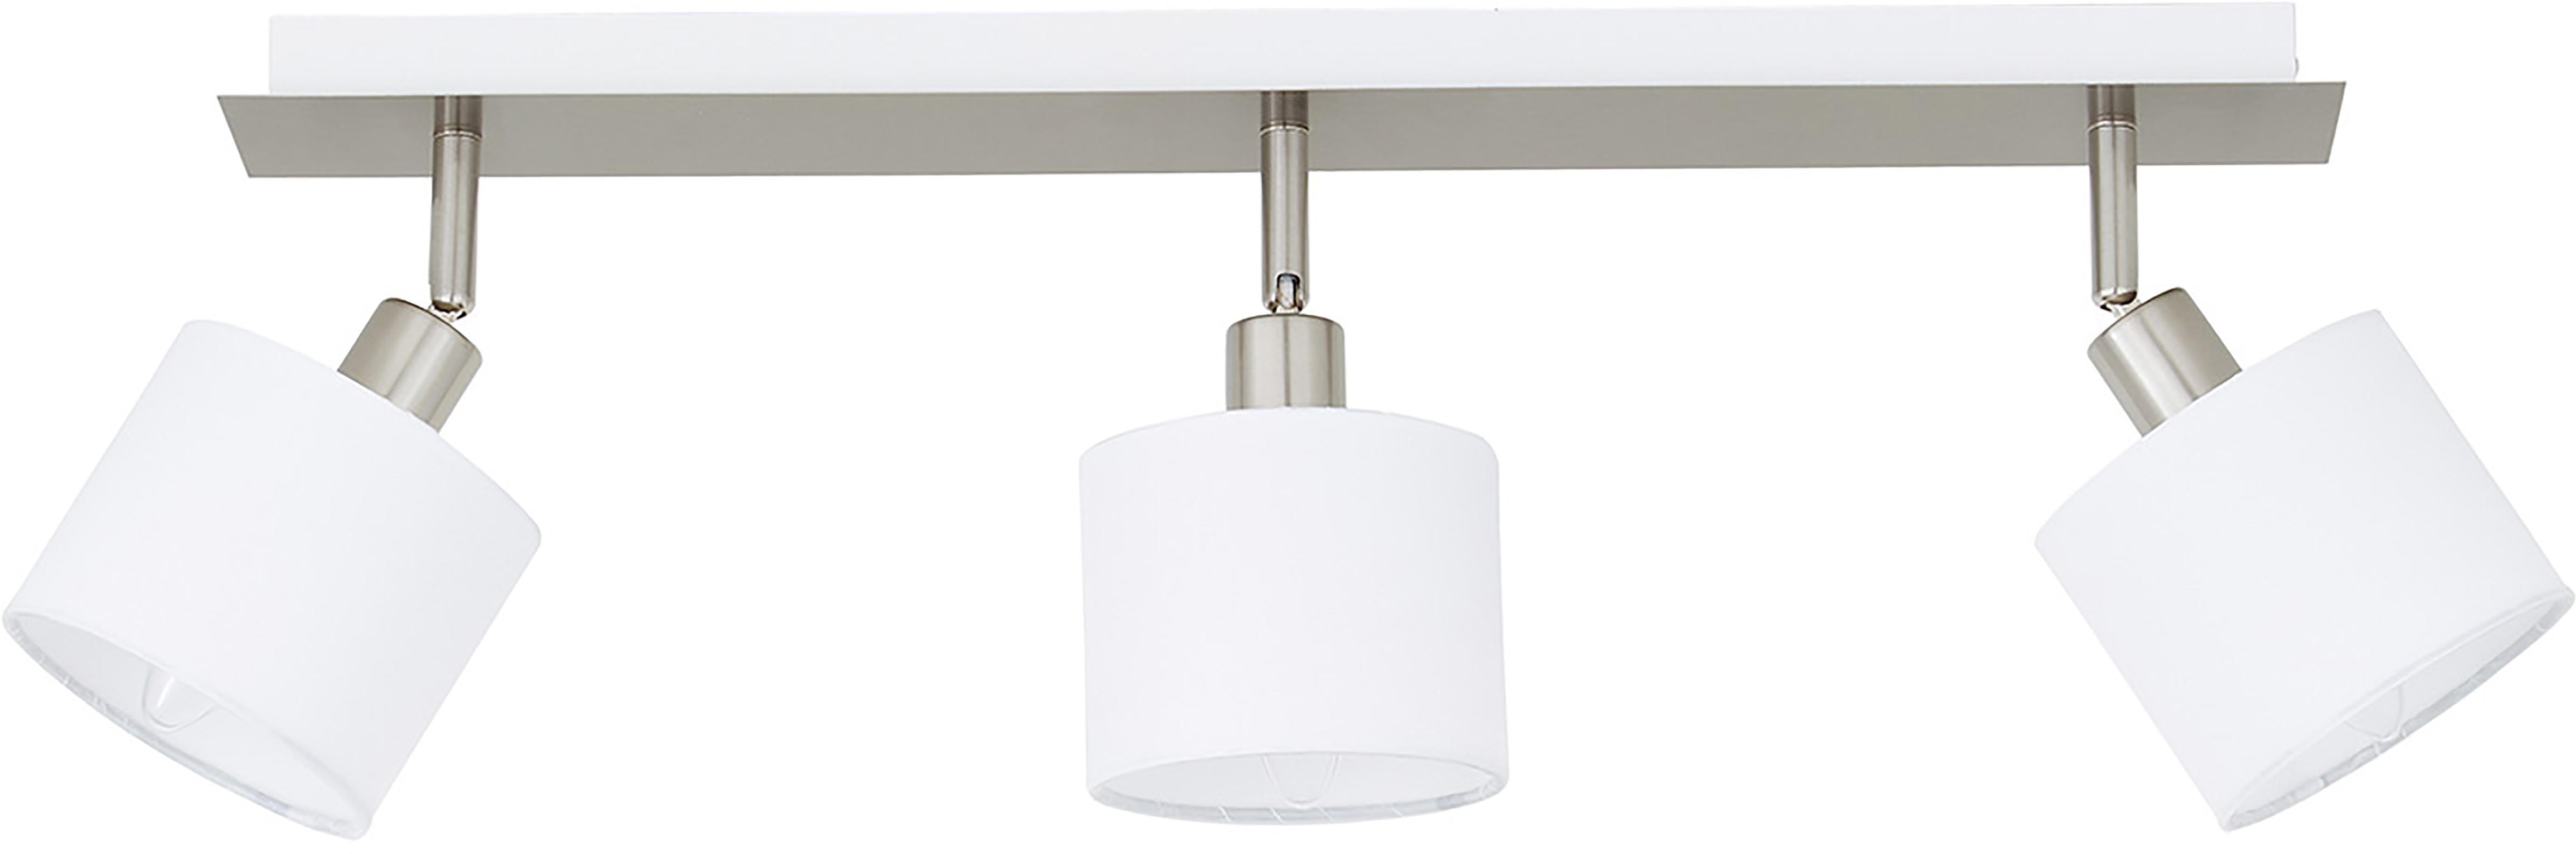 Deckenstrahler Casper, Baldachin: Metall, vernickelt, Silberfarben,Weiss, 56 x 7 cm